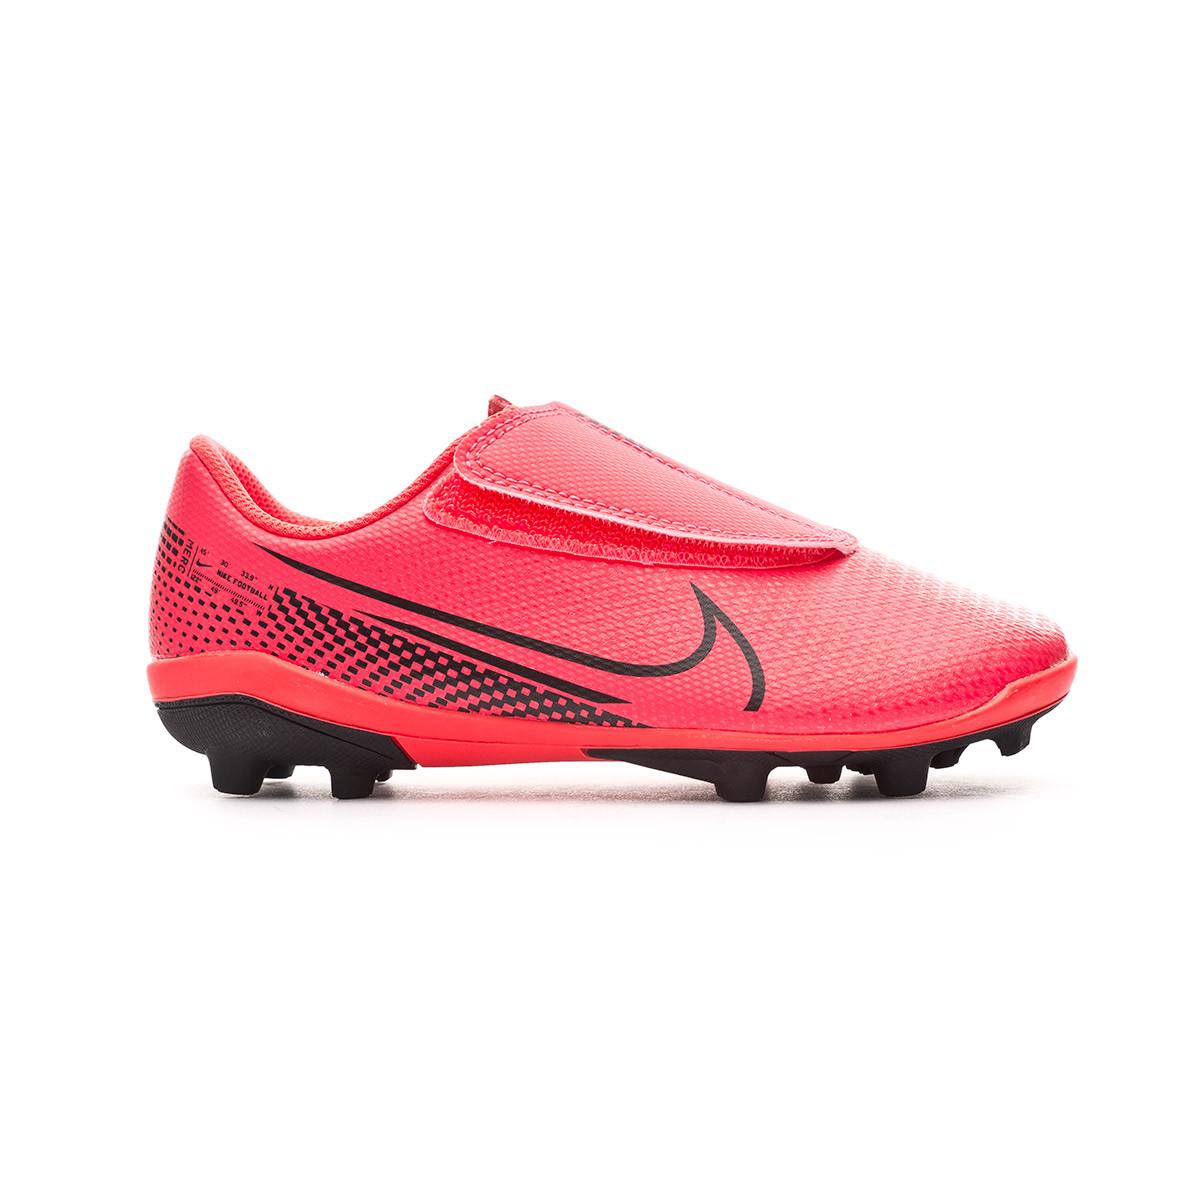 Chaussure de foot Nike Mercurial Vapor XIII Club MG PS avec scratch Enfant